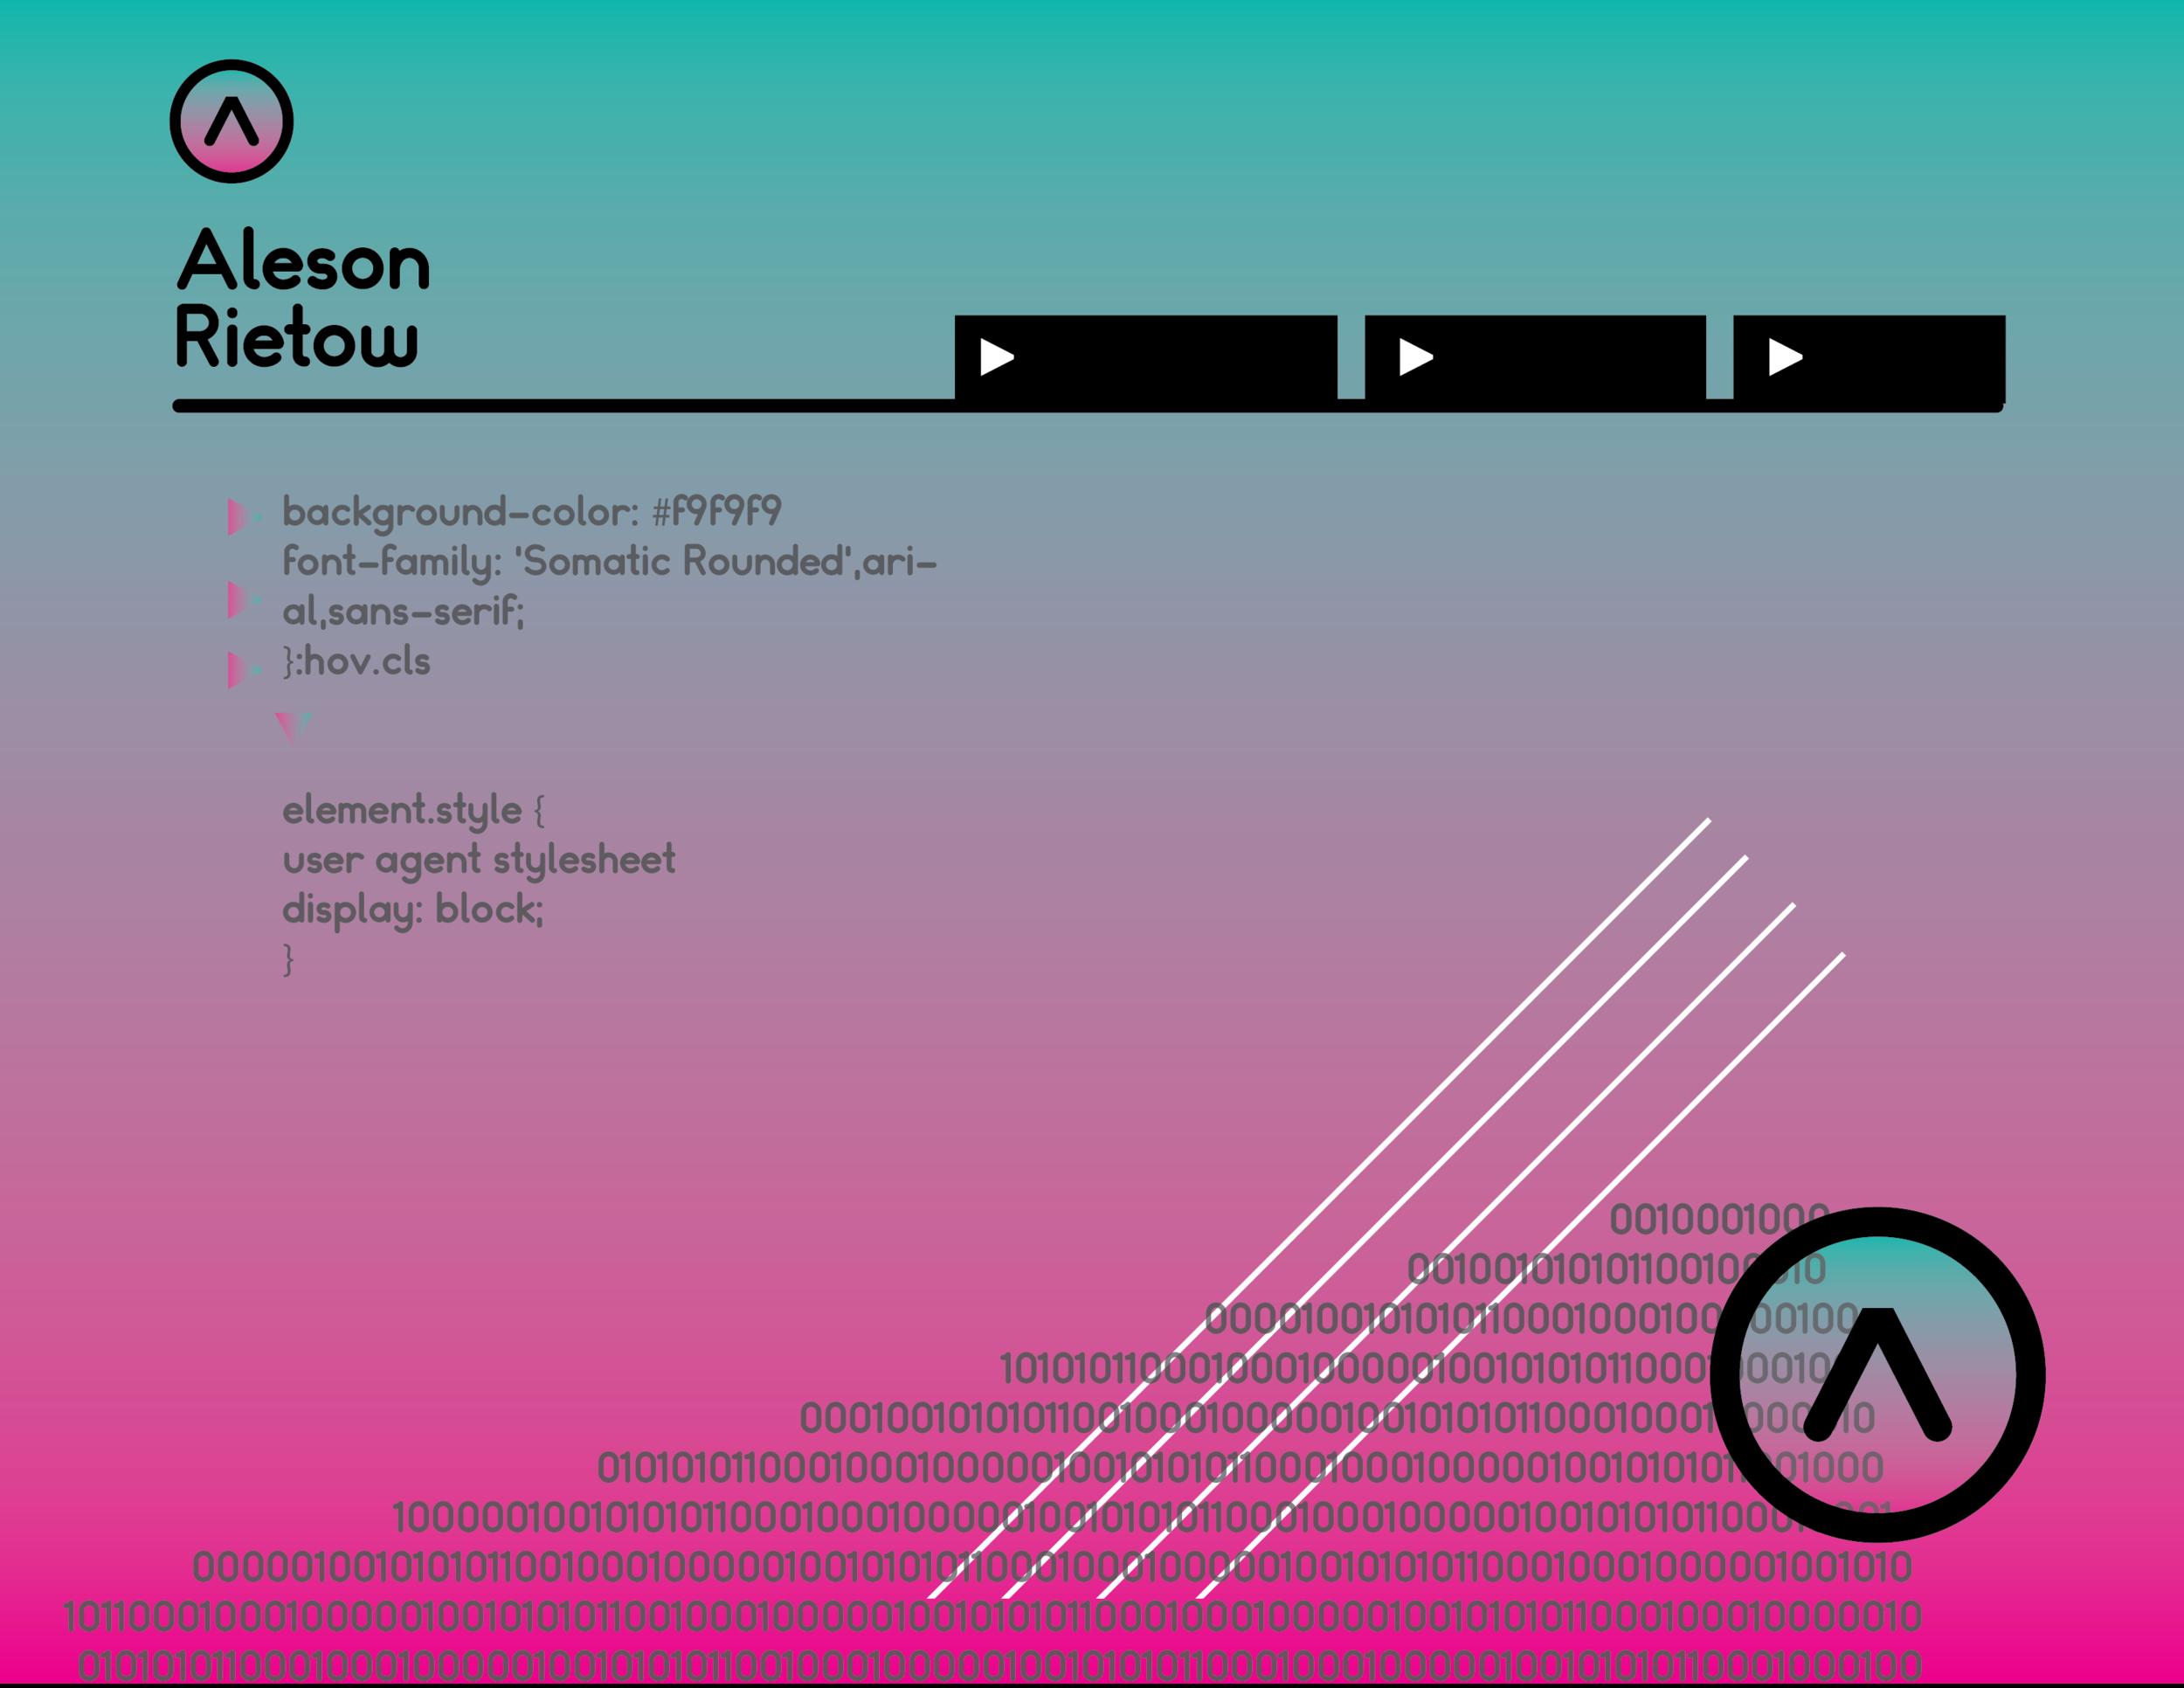 LogoMockup_Aleson's Brand-03.png